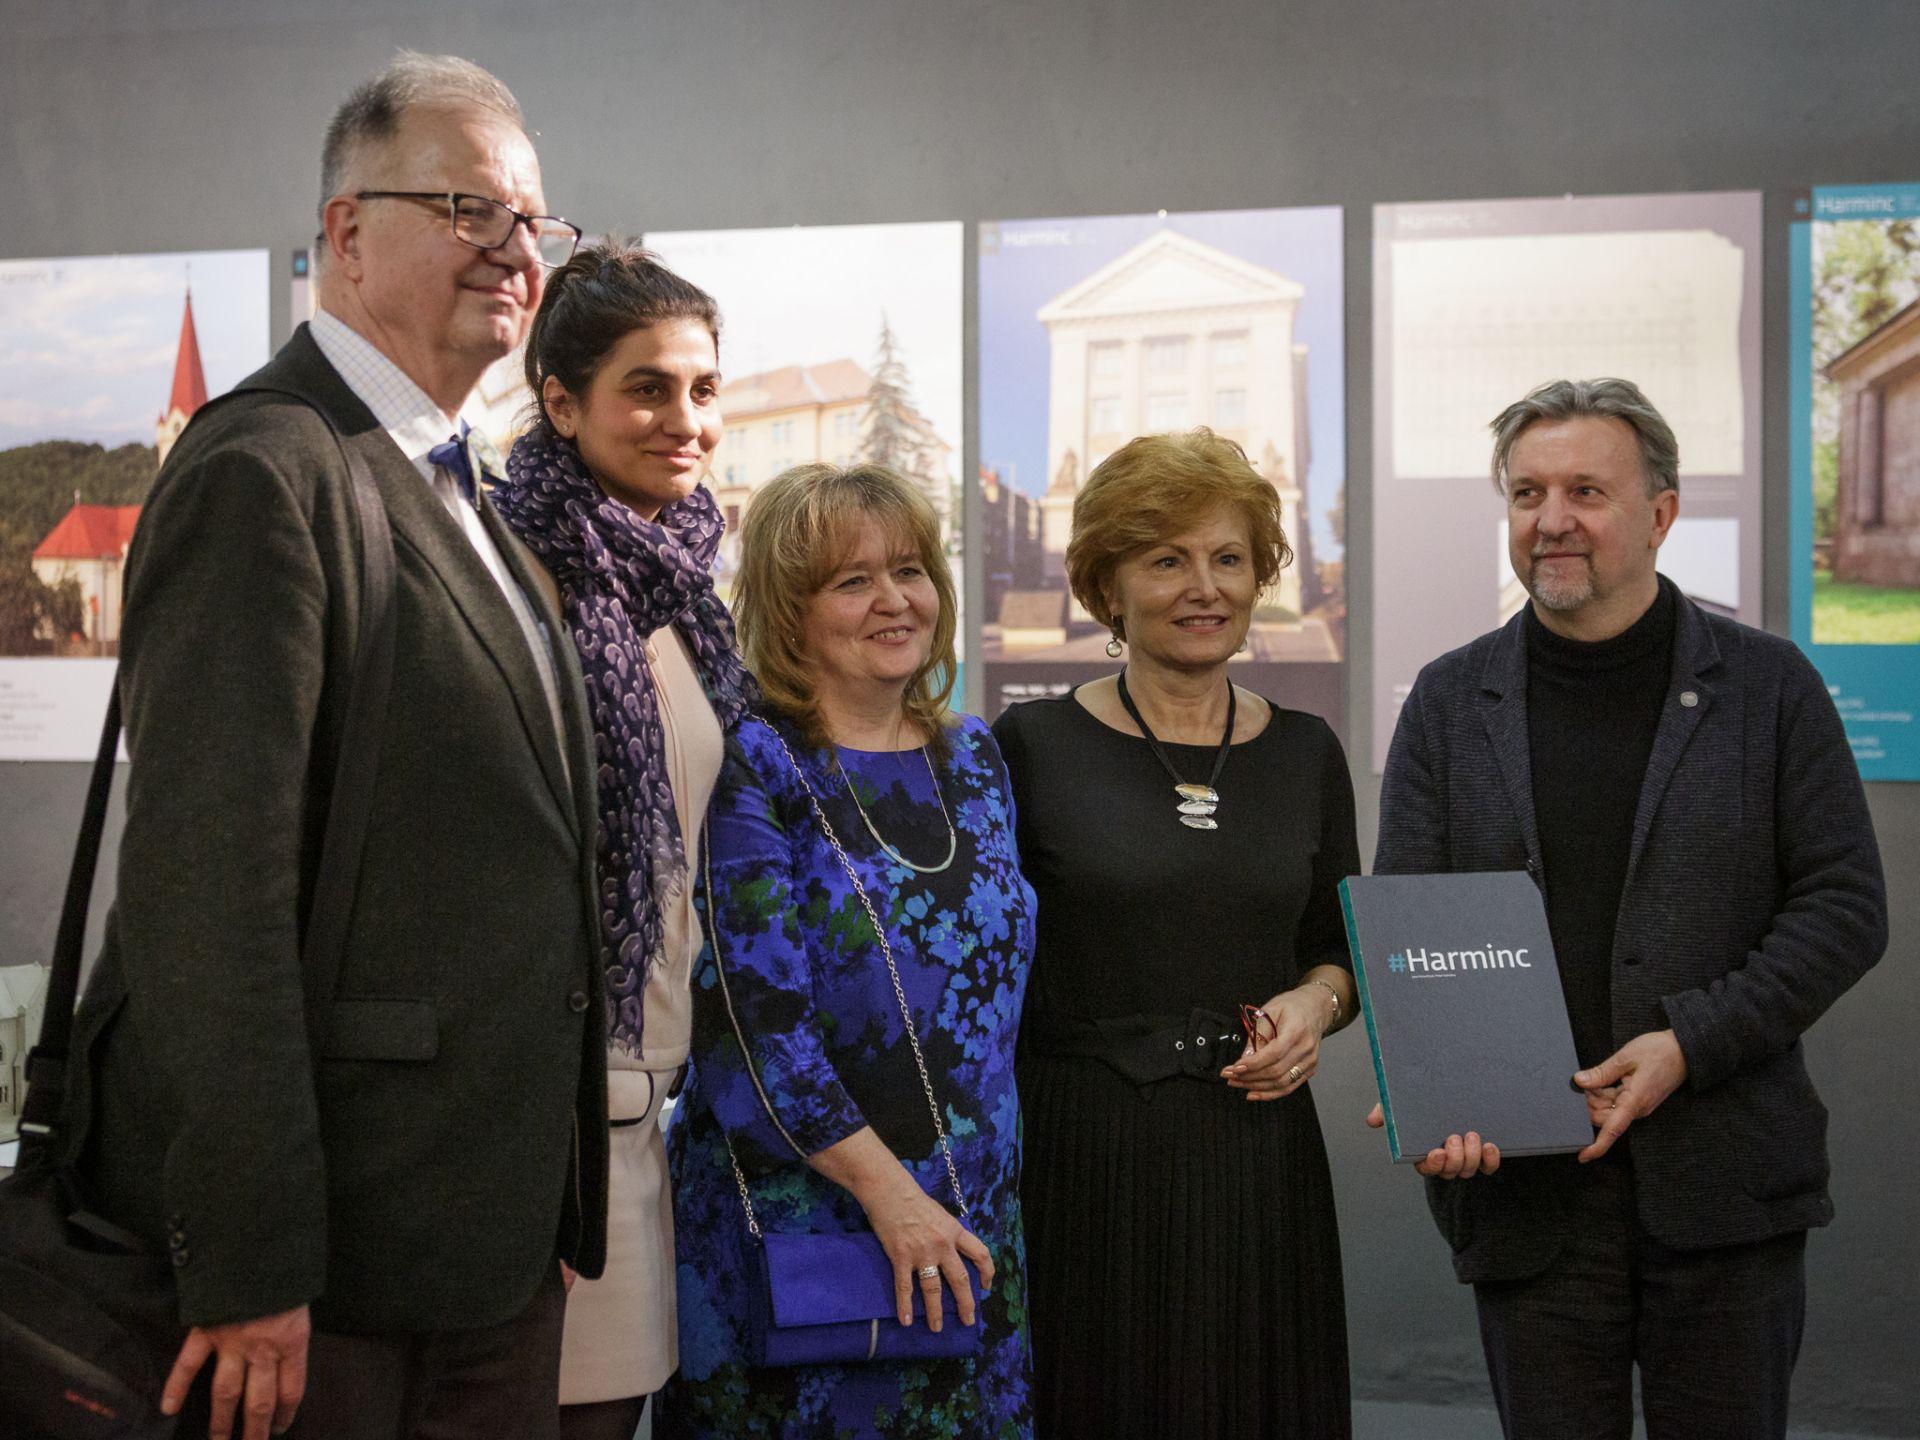 Z výstavy vo Fuge. Zľava Juraj Hermann, Ildikó Siposová, Jana Pohaničová, Magdaléna Fazekašová a András Kriszán.